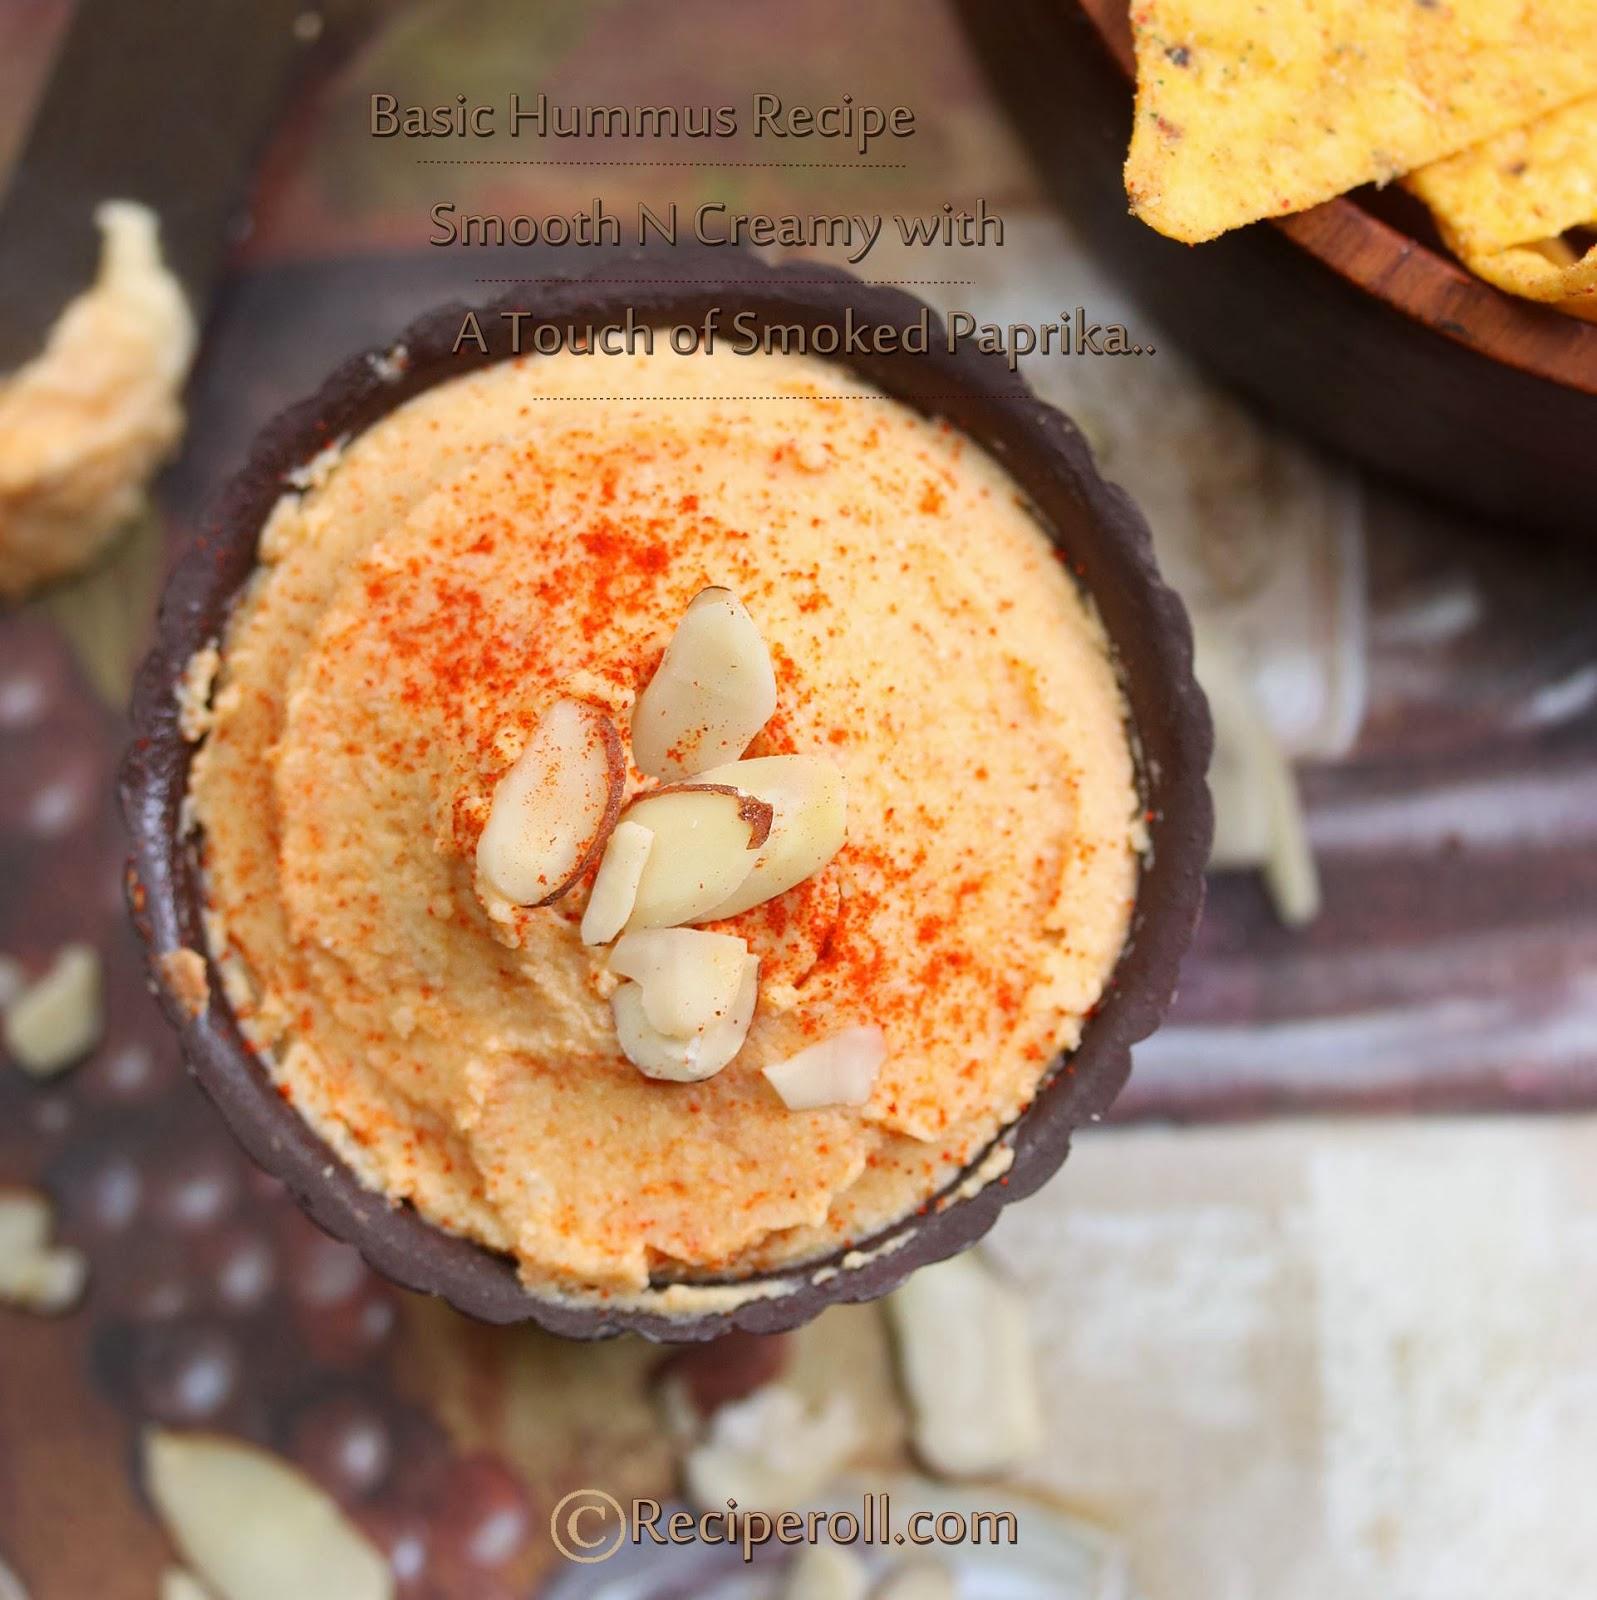 Basic Hummus Recipe ~ Sankeerthanam (Reciperoll.com)|Recipes | Cake ...